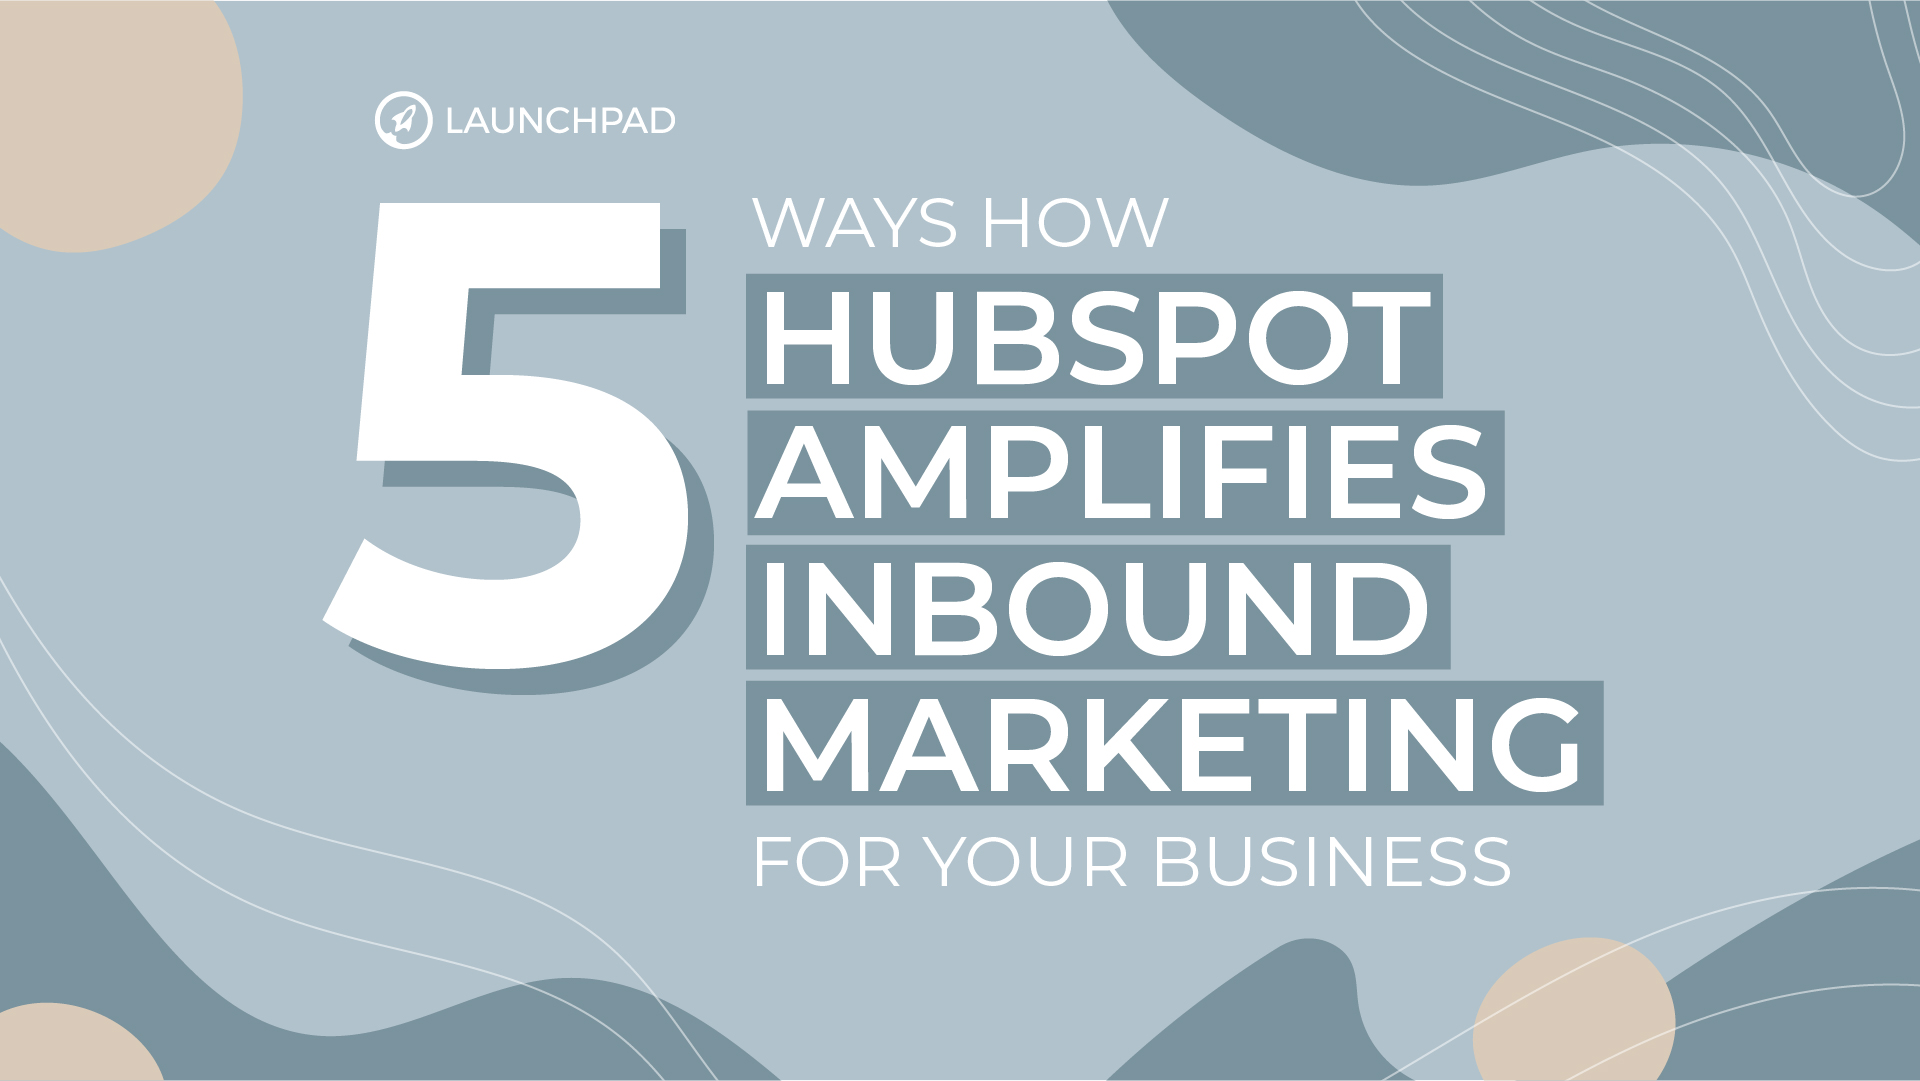 Blog[SM]-5 Ways How HubSpot Amplifies Inbound Marketing for Your Business-02